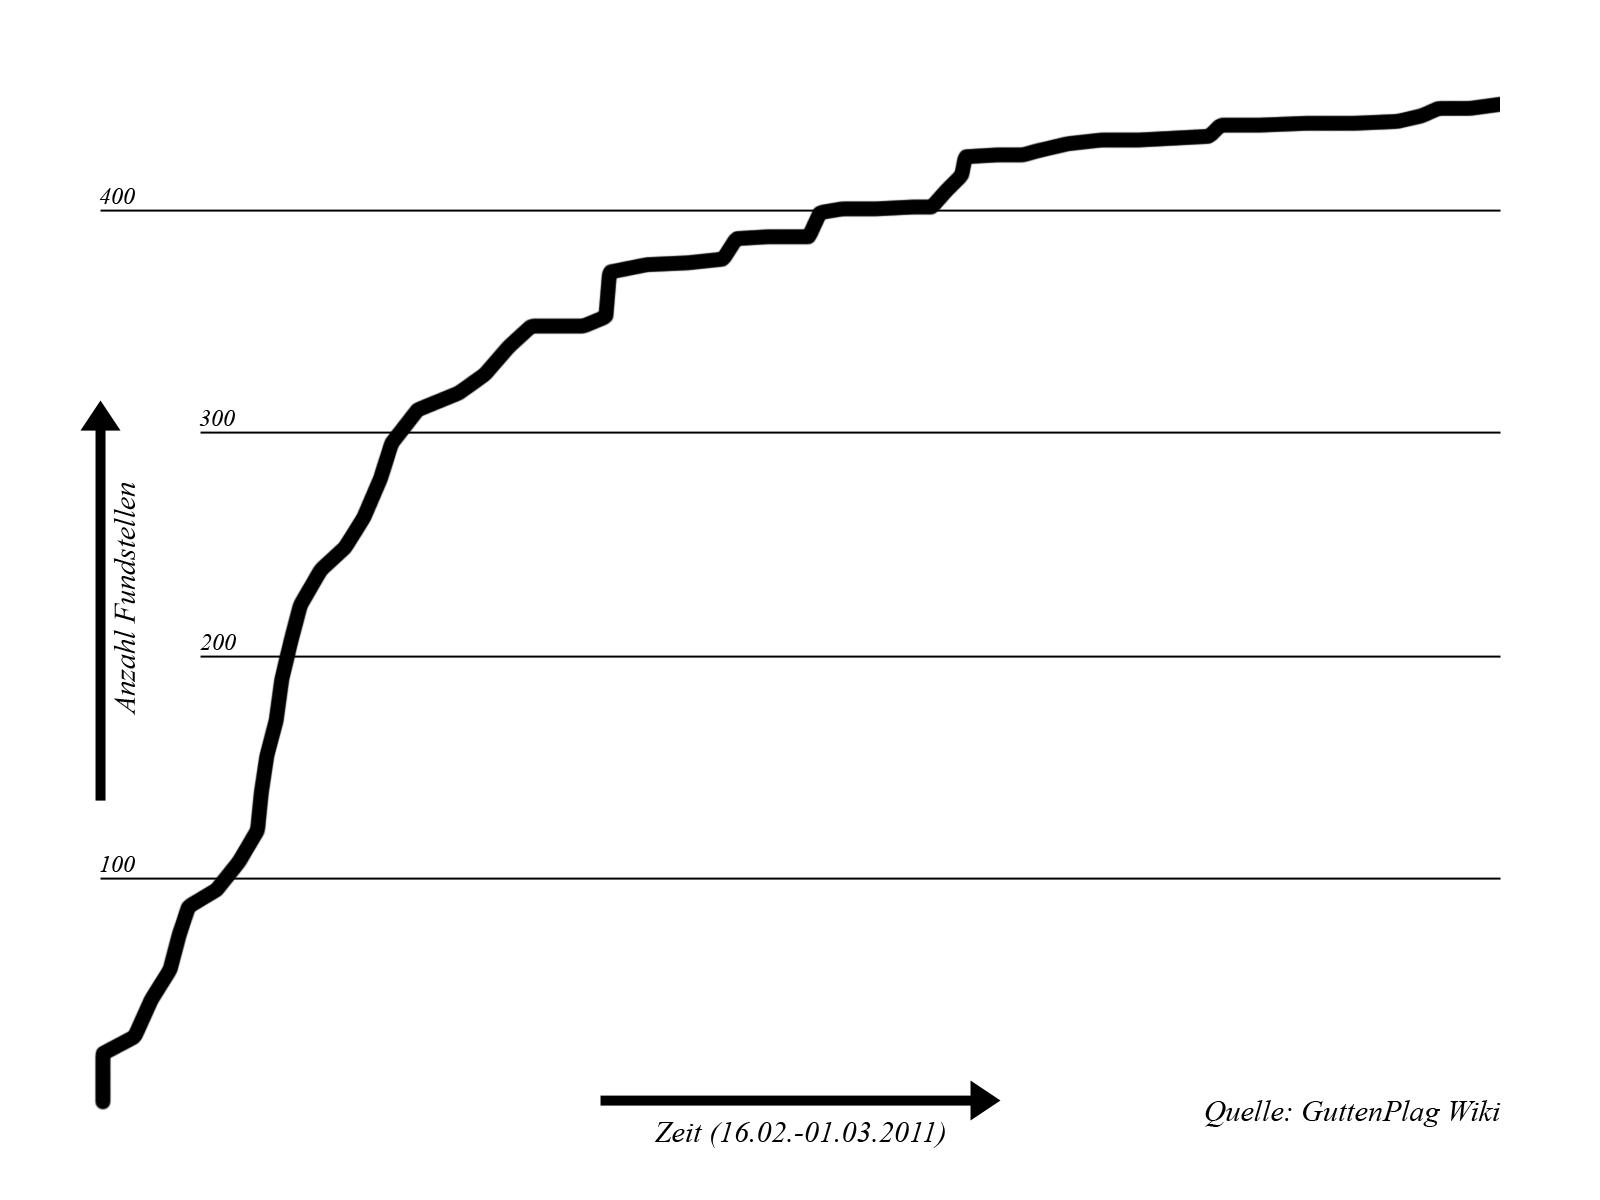 Bild - Diagramm blanko.png | GuttenPlag Wiki | FANDOM powered by Wikia